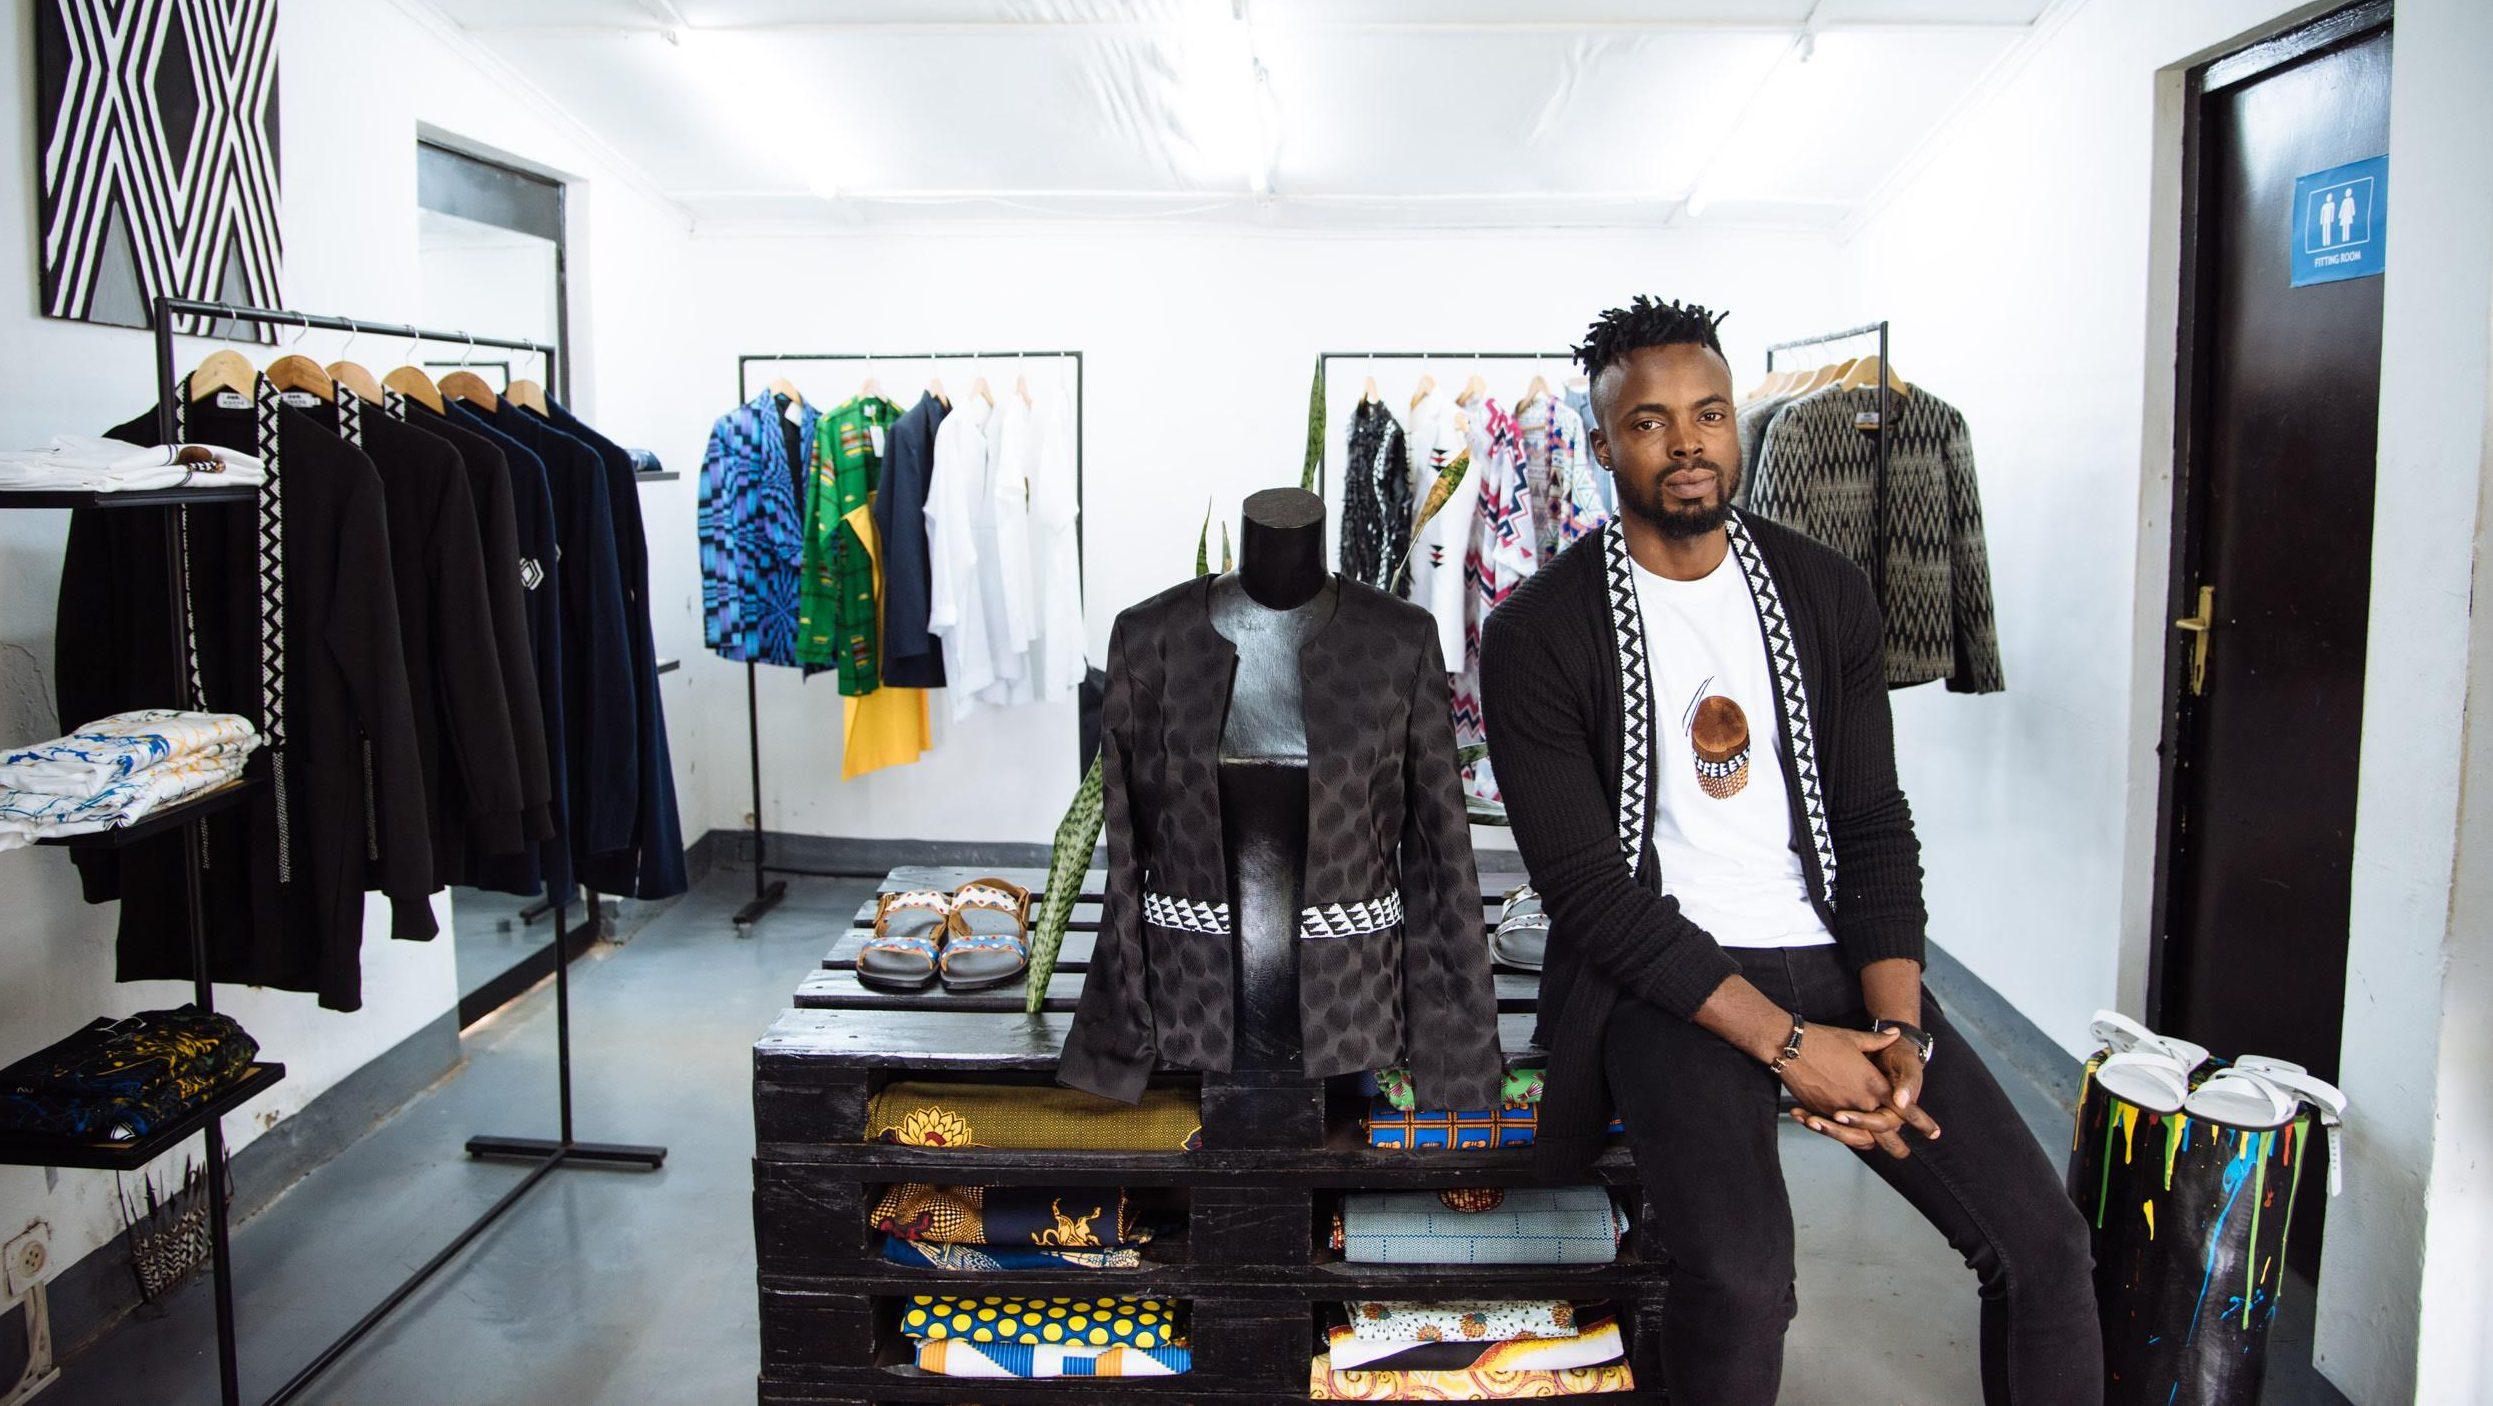 qz.com - Abdi Latif Dahir - How 'Made in Rwanda' is breathing life into Kigali's fashion scene